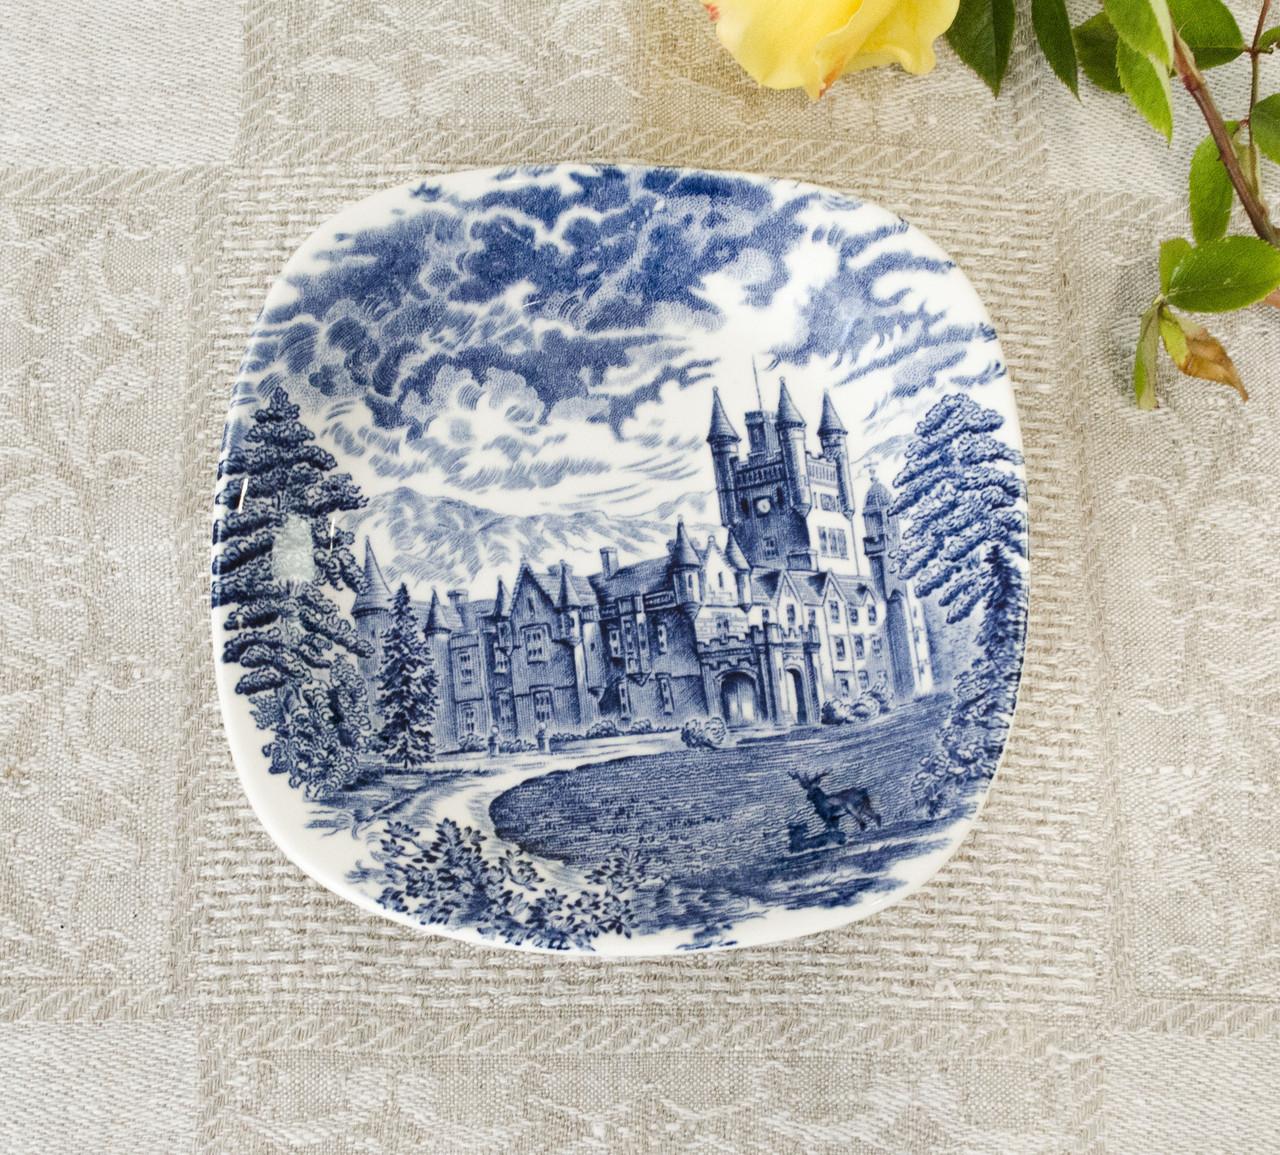 Коллекционная сине-белая фарфоровая тарелочка, Англия, Enoch Wedgwood, Royal homes of Britain